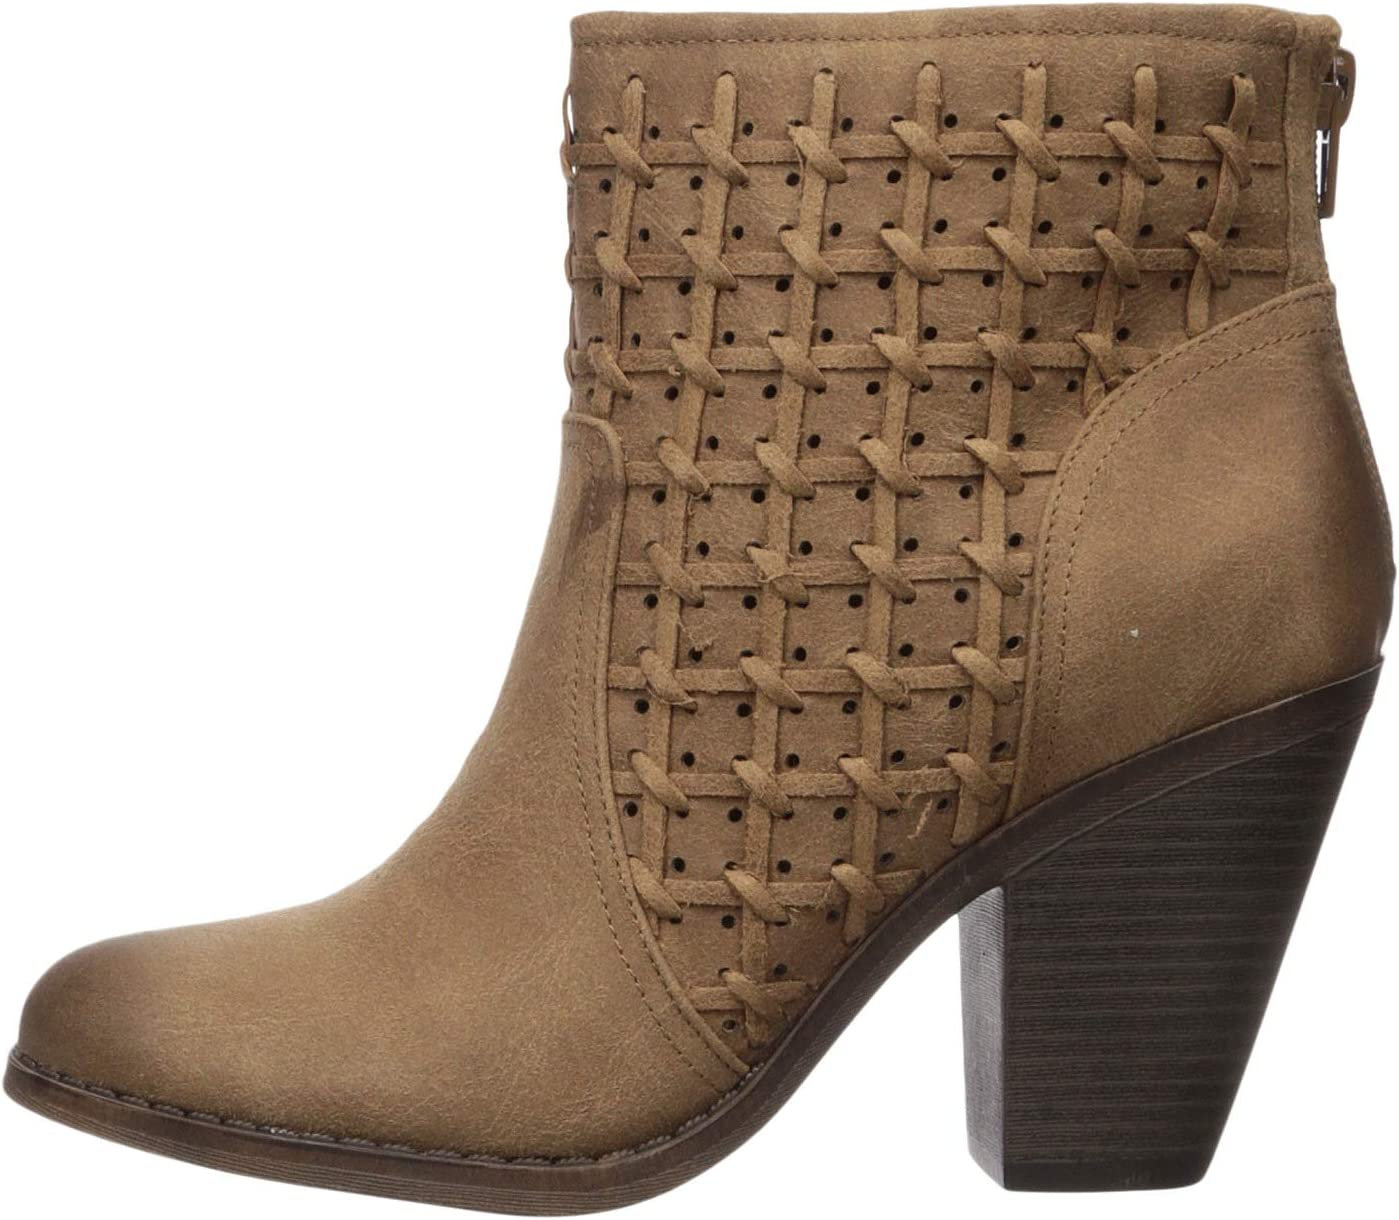 Fergalicious Worthy | Women's shoes | 2020 Newest